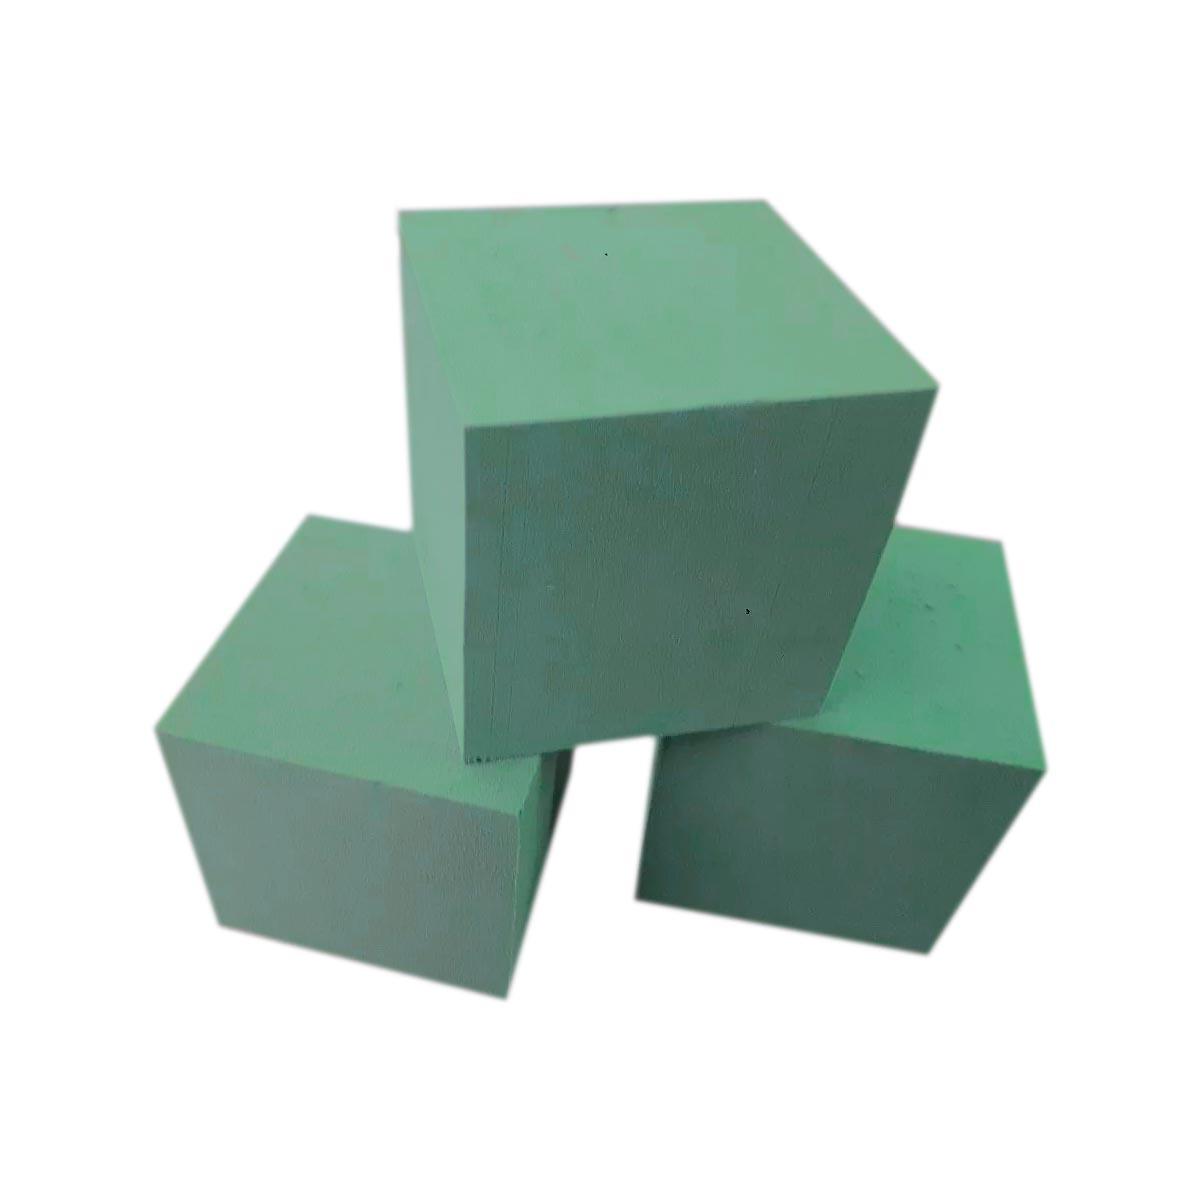 BLOCO ESPUMA FLORAL T2 15,0 x 15,0 x 15,0 cm - 12 UNIDADES